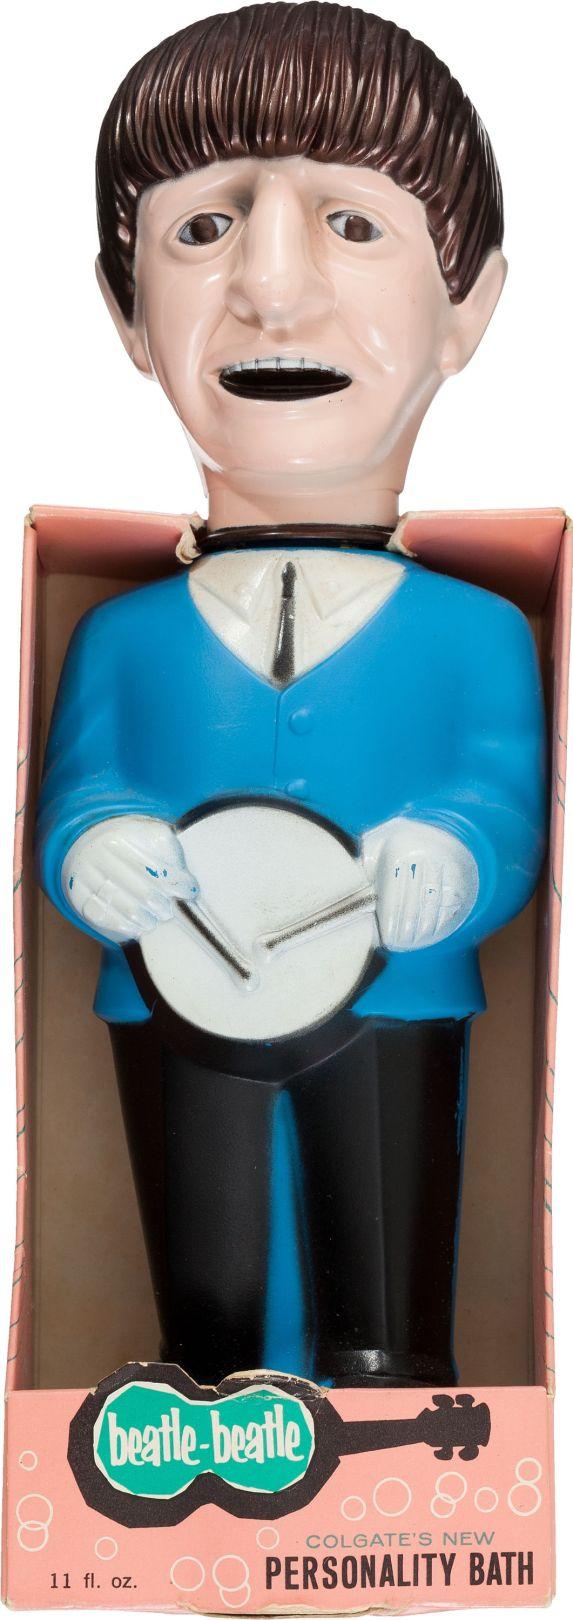 Beatles Ringo Starr Bubble Bath Doll (Colgate, 1965)